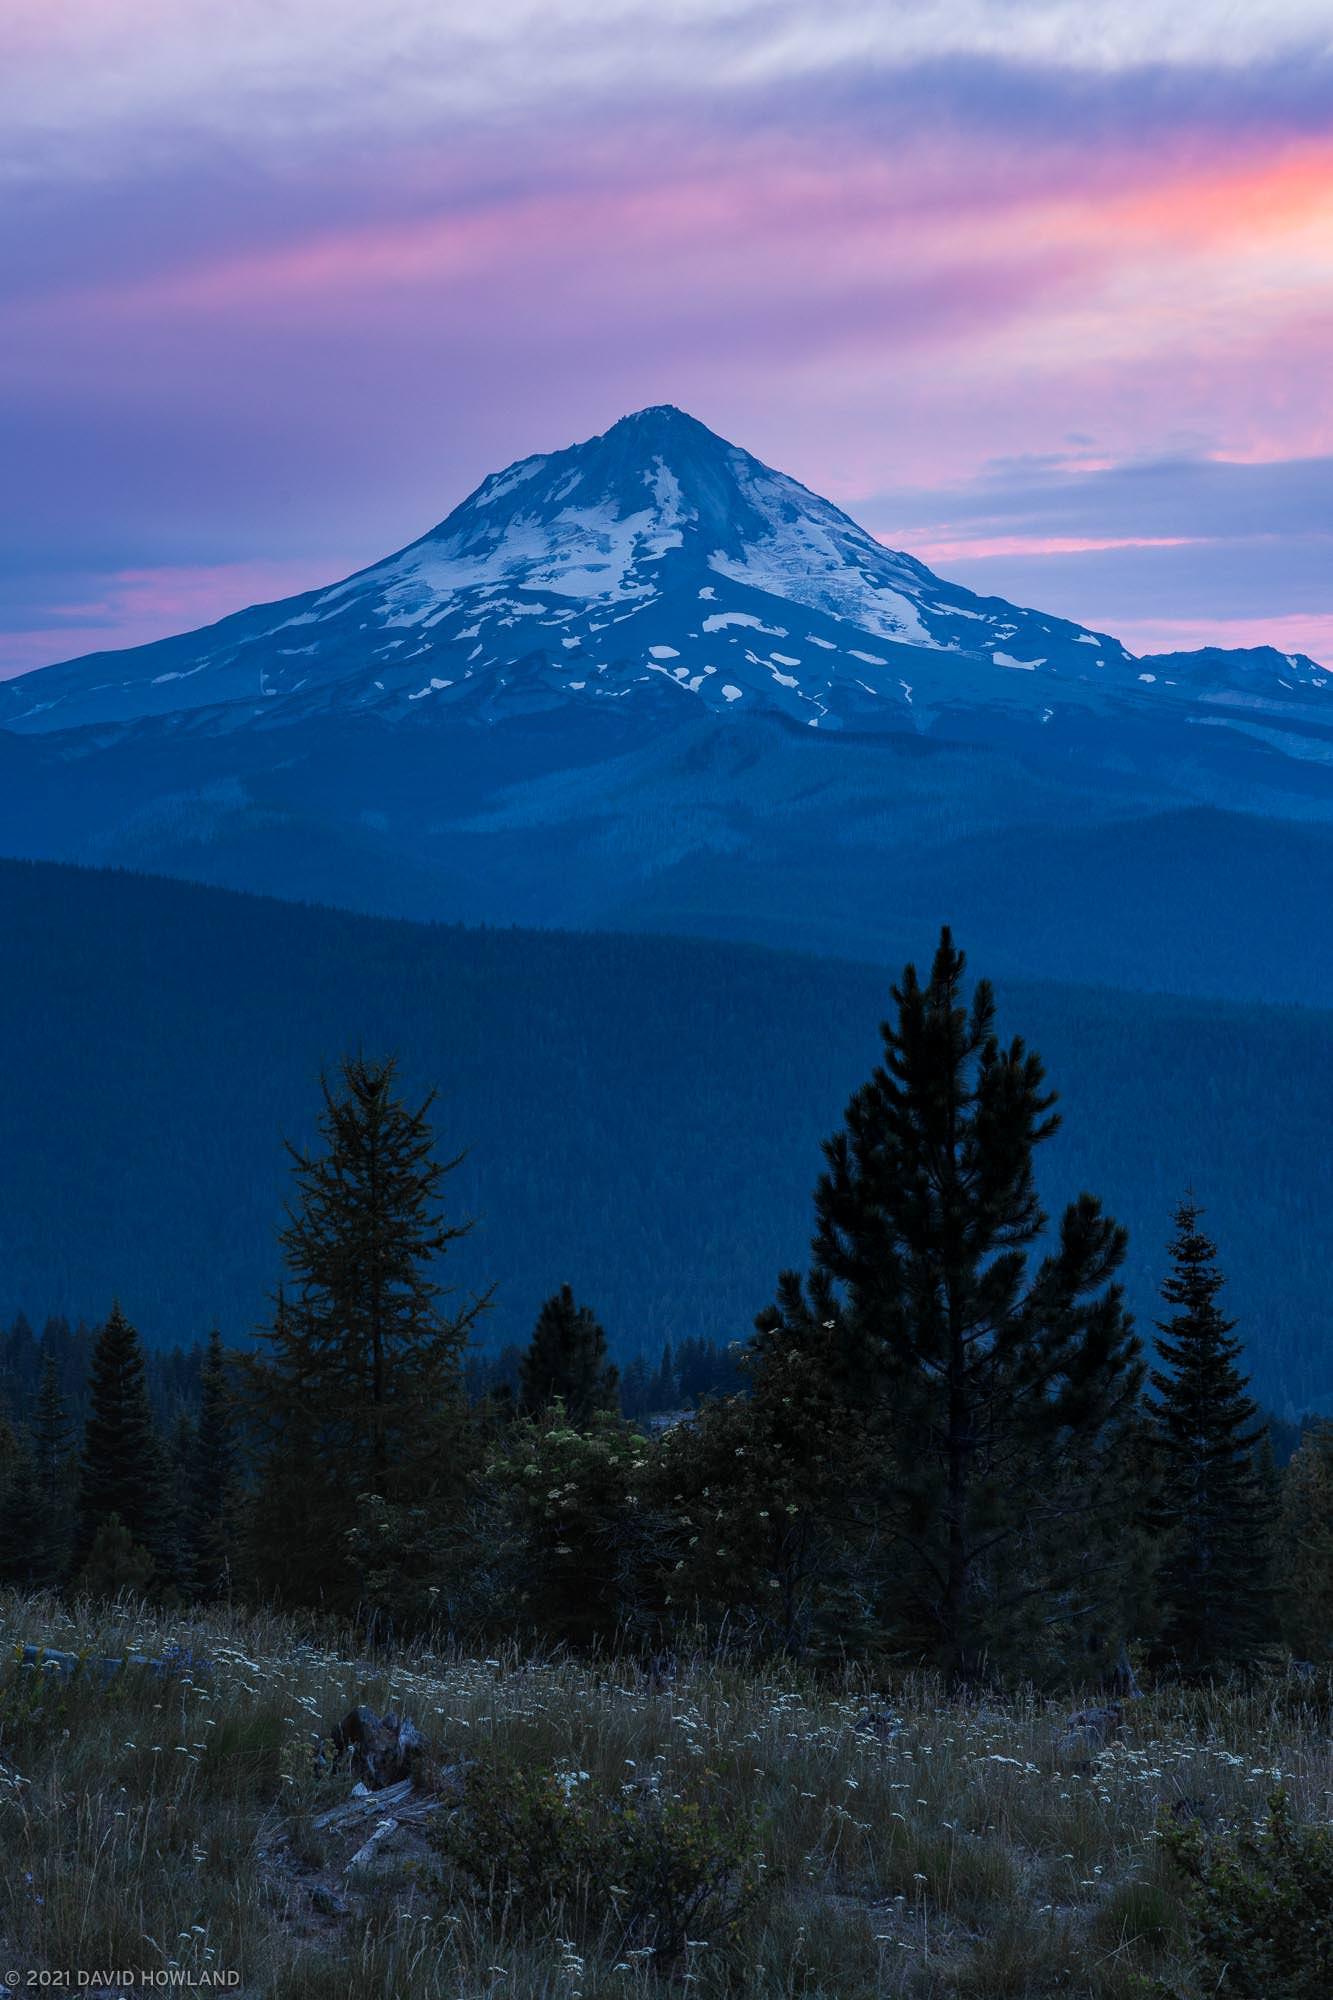 Wildfire Sunset over Mt Hood